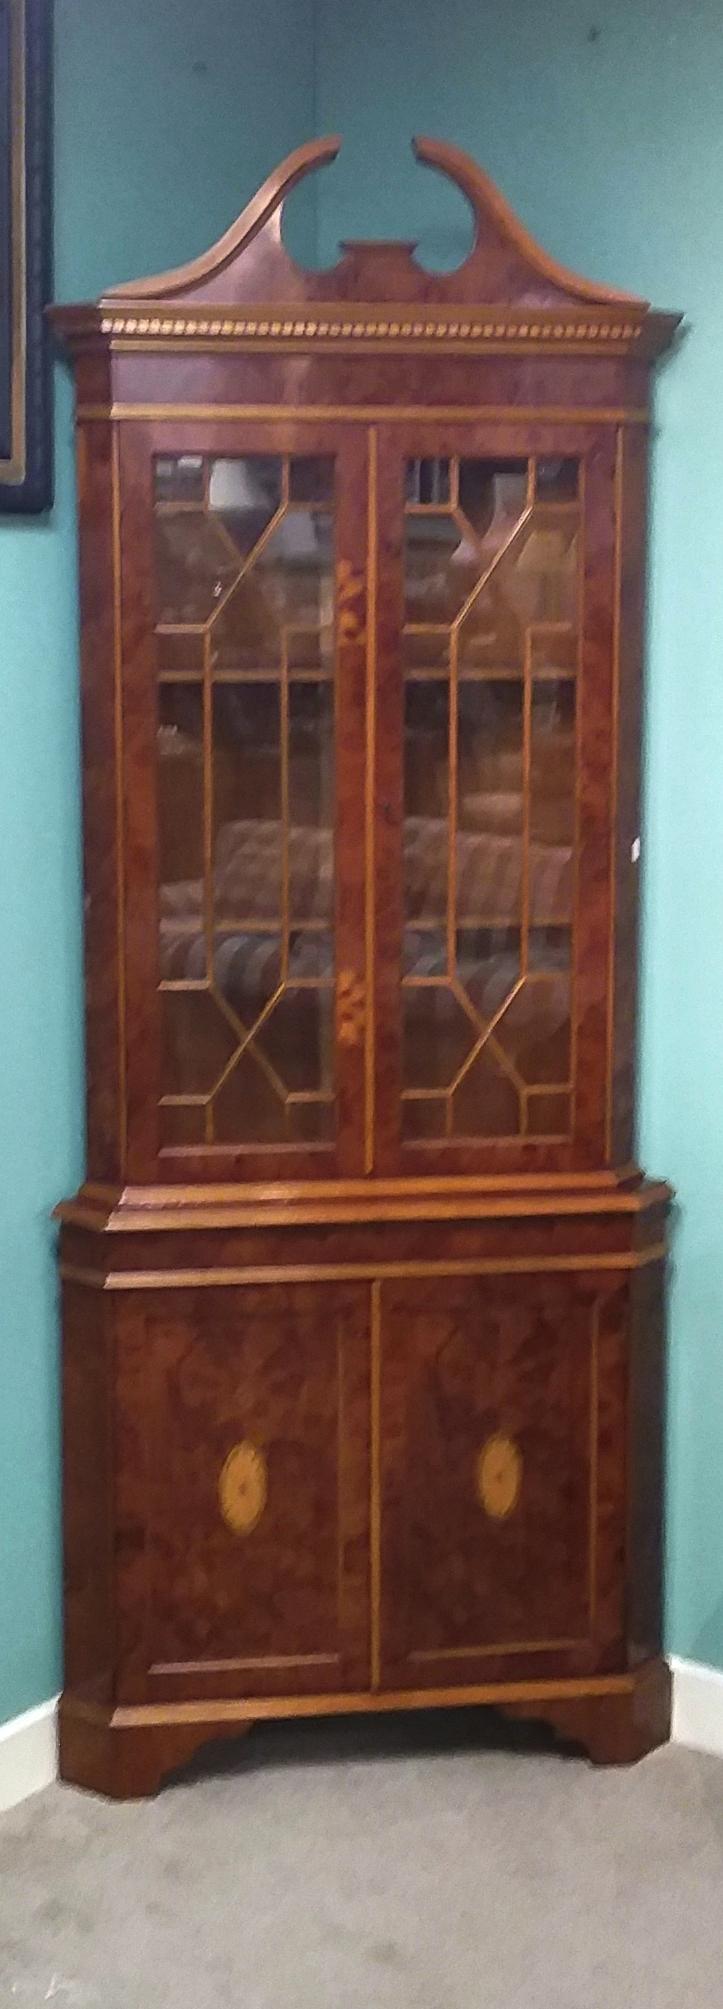 Lot 31 - Quality Yewwood Corner Display Cabinet Dimensions: 85cm W 54cm D 213cm H